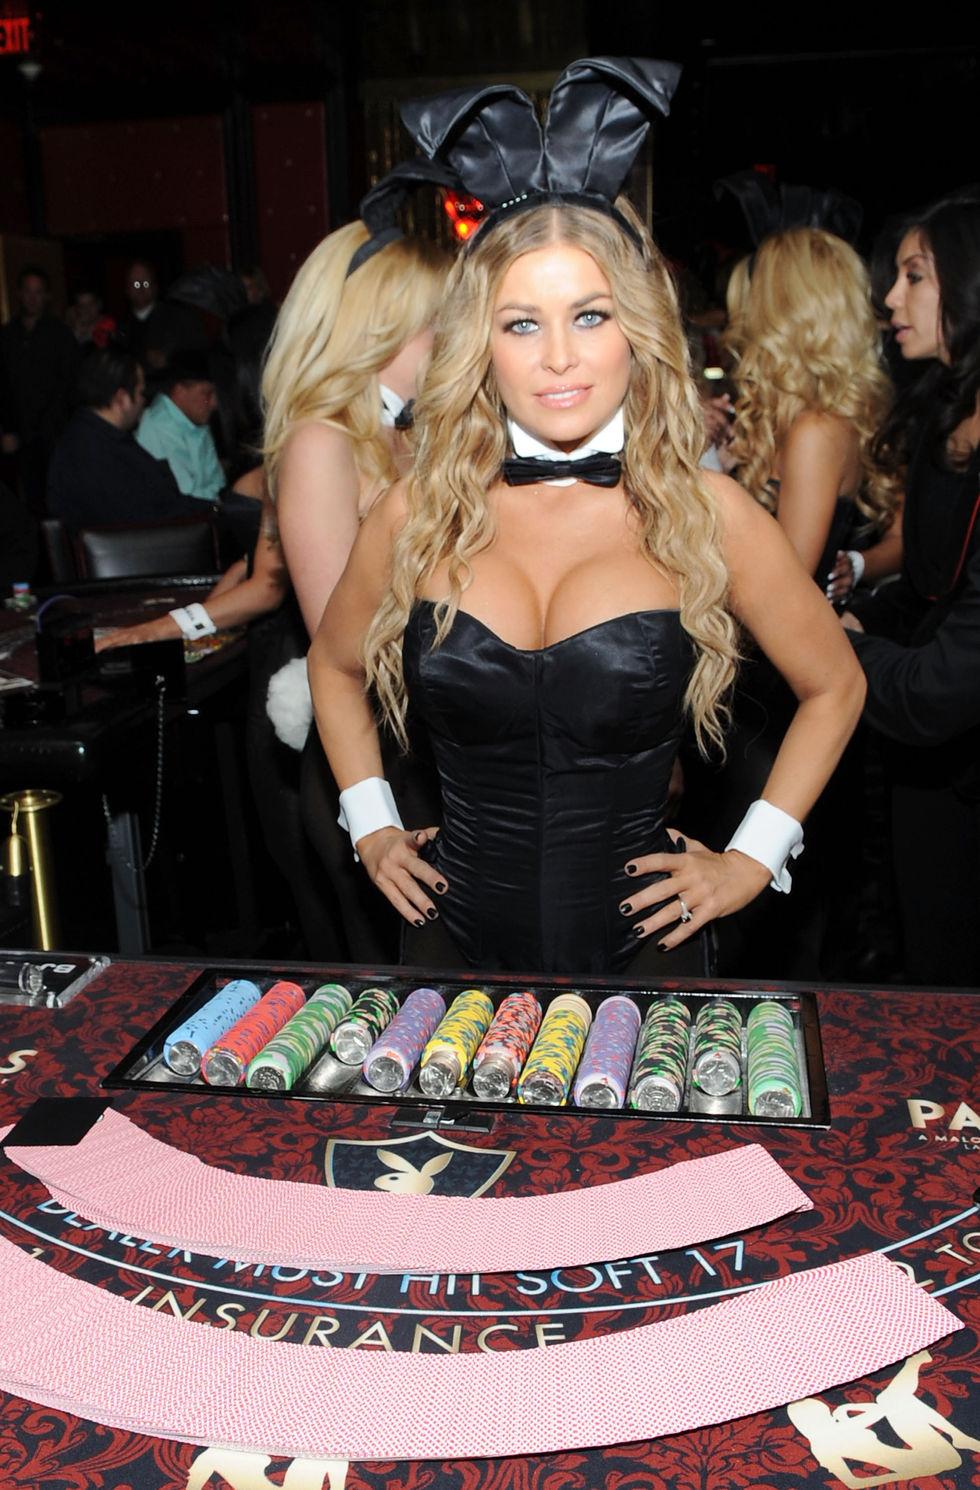 carmen-electra-at-playboy-club-at-the-palms-casino-resort-in-las-vegas-10